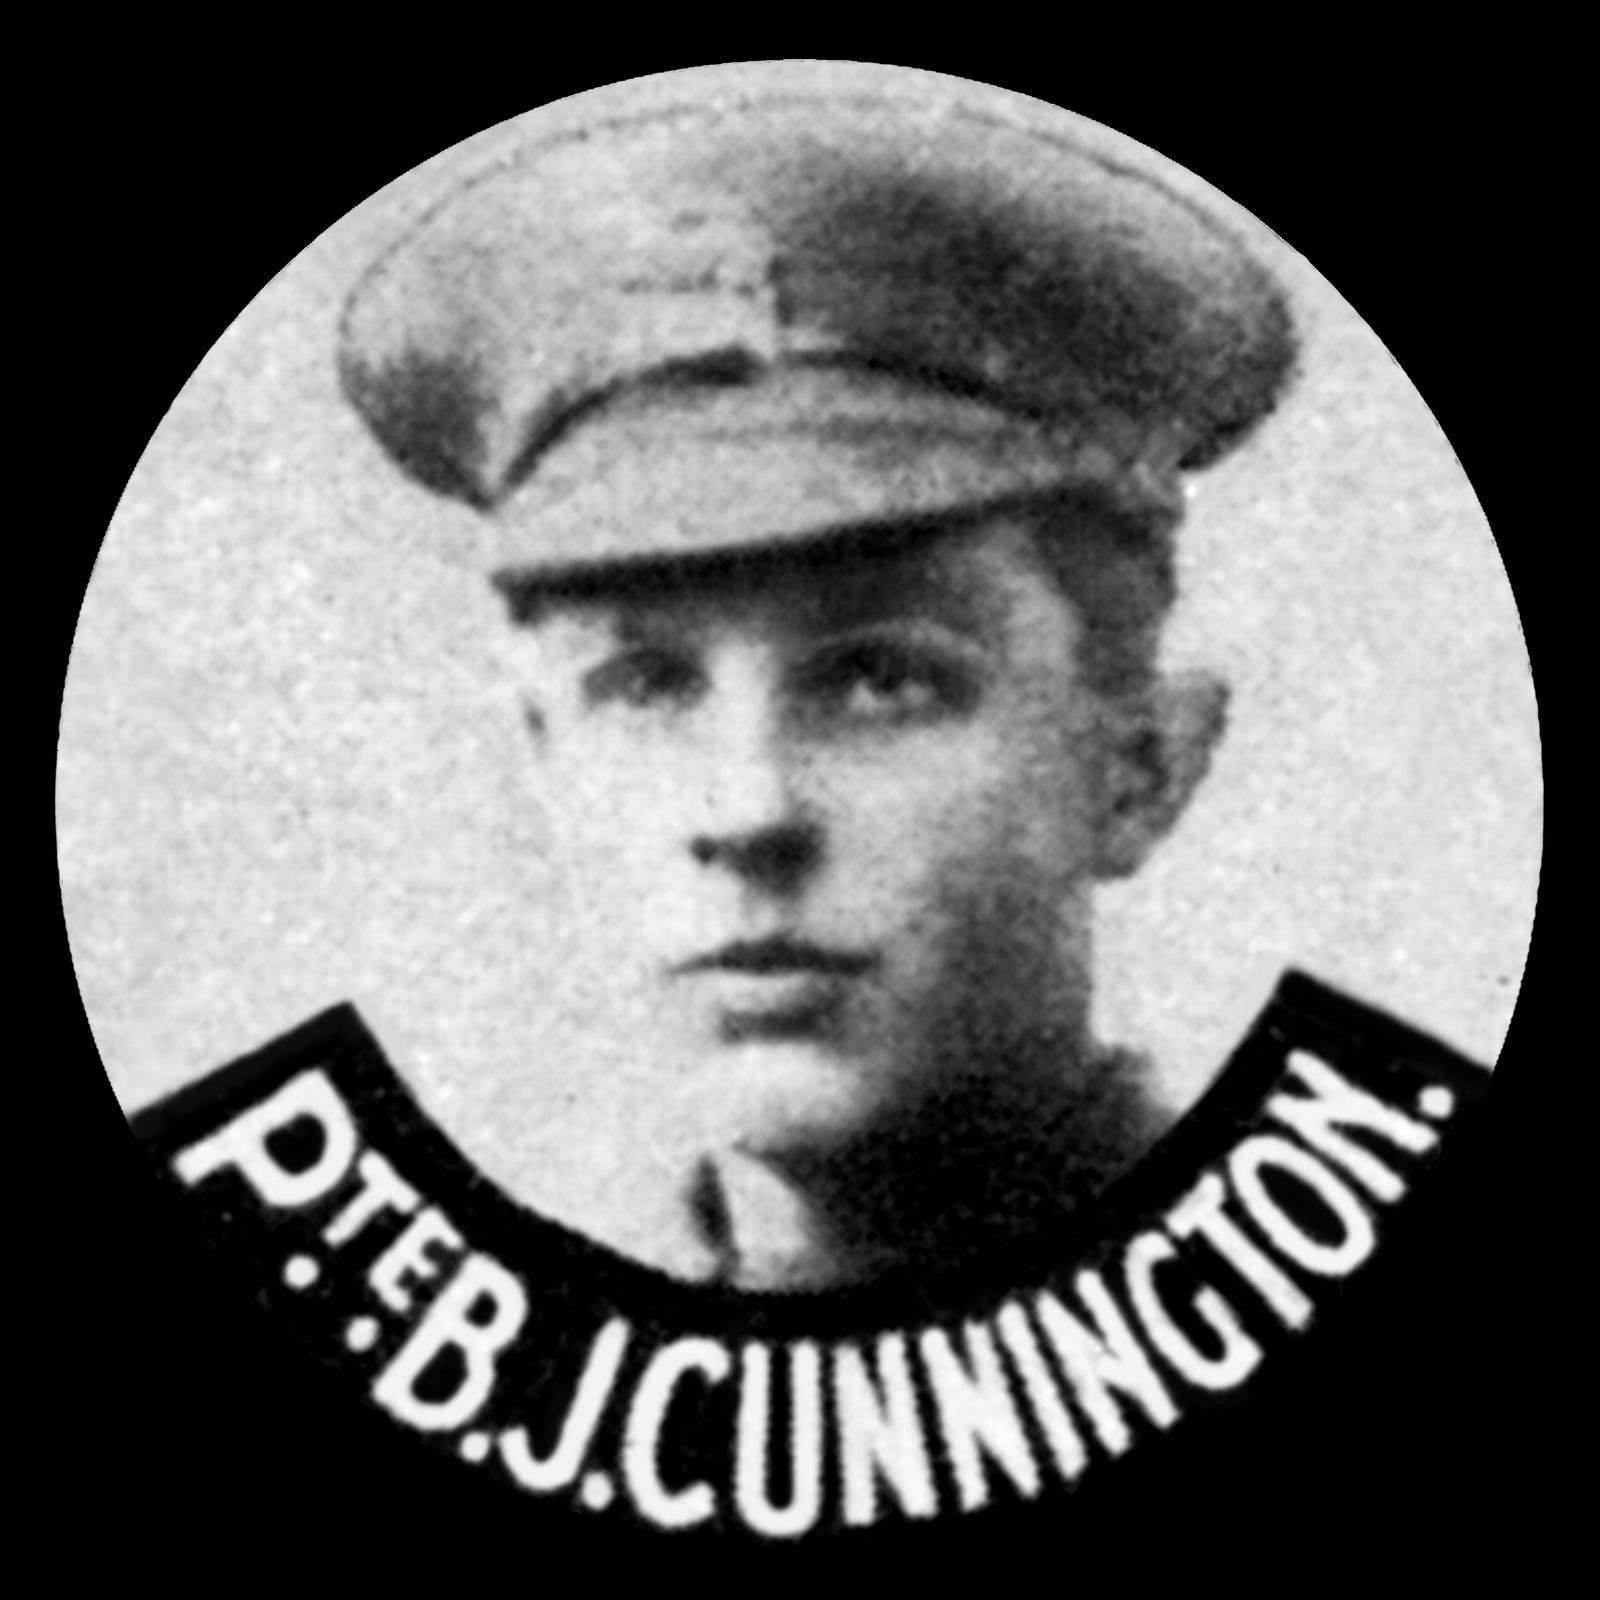 CUNNINGTON Bernard John